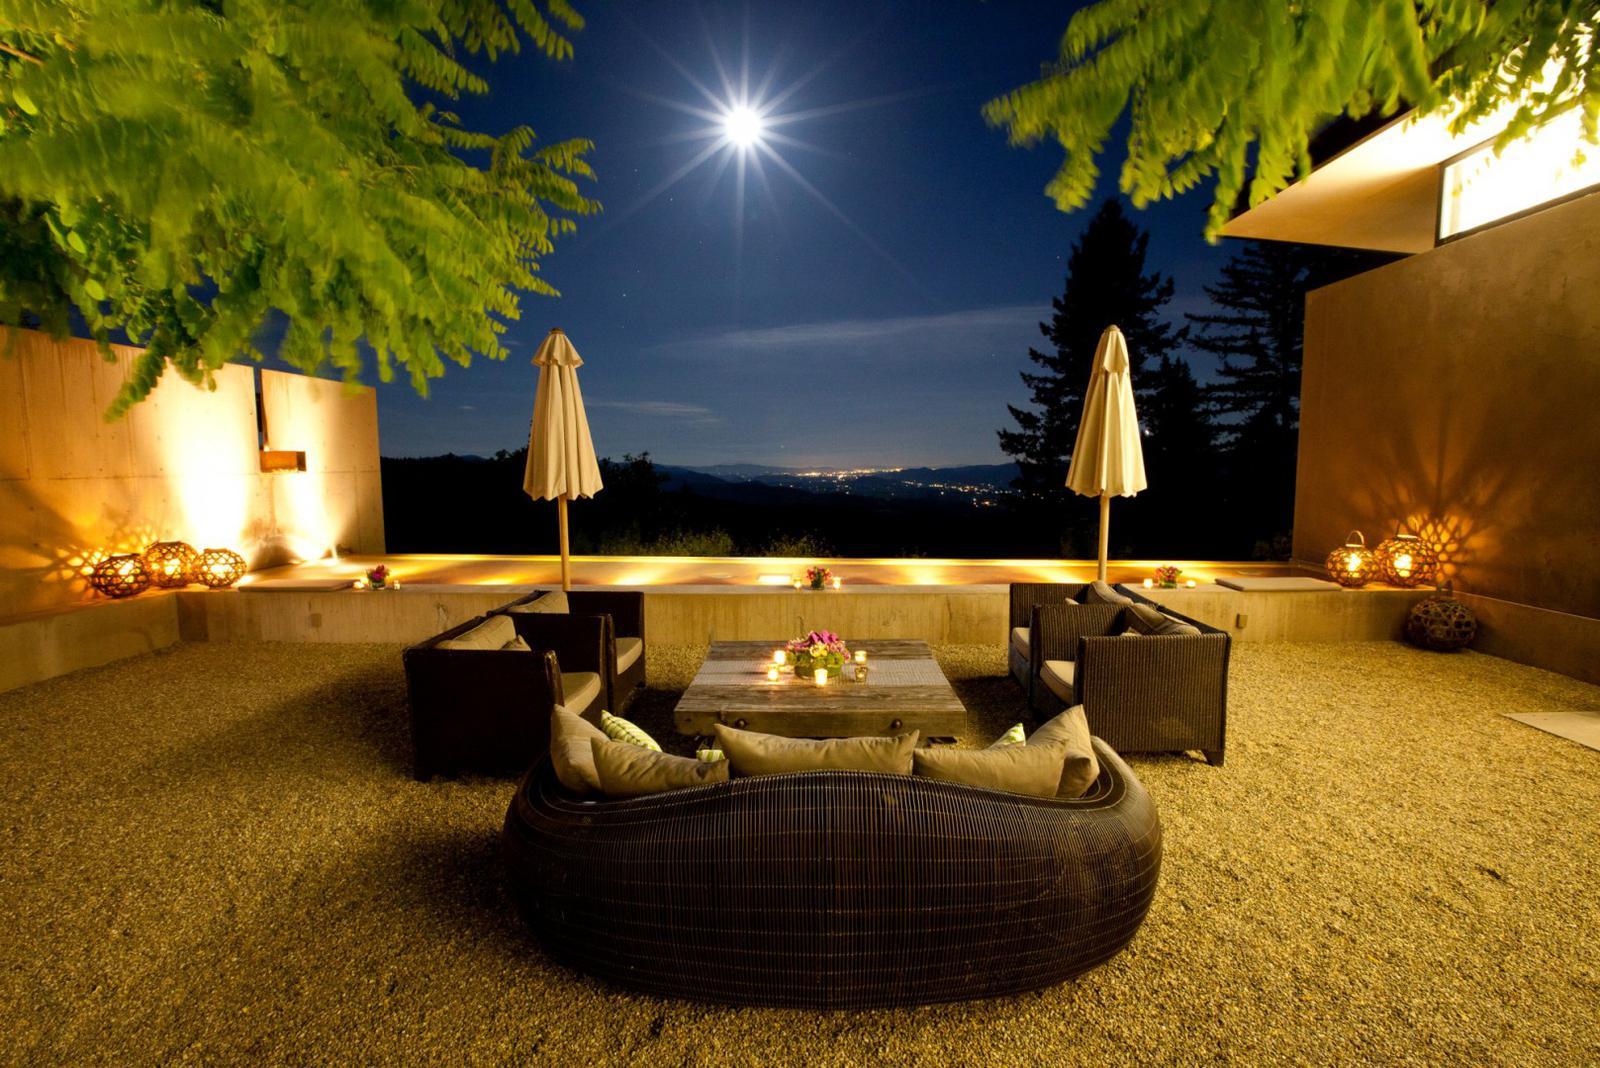 Night Courtyard, courtesy Plump Jack Estate Winery